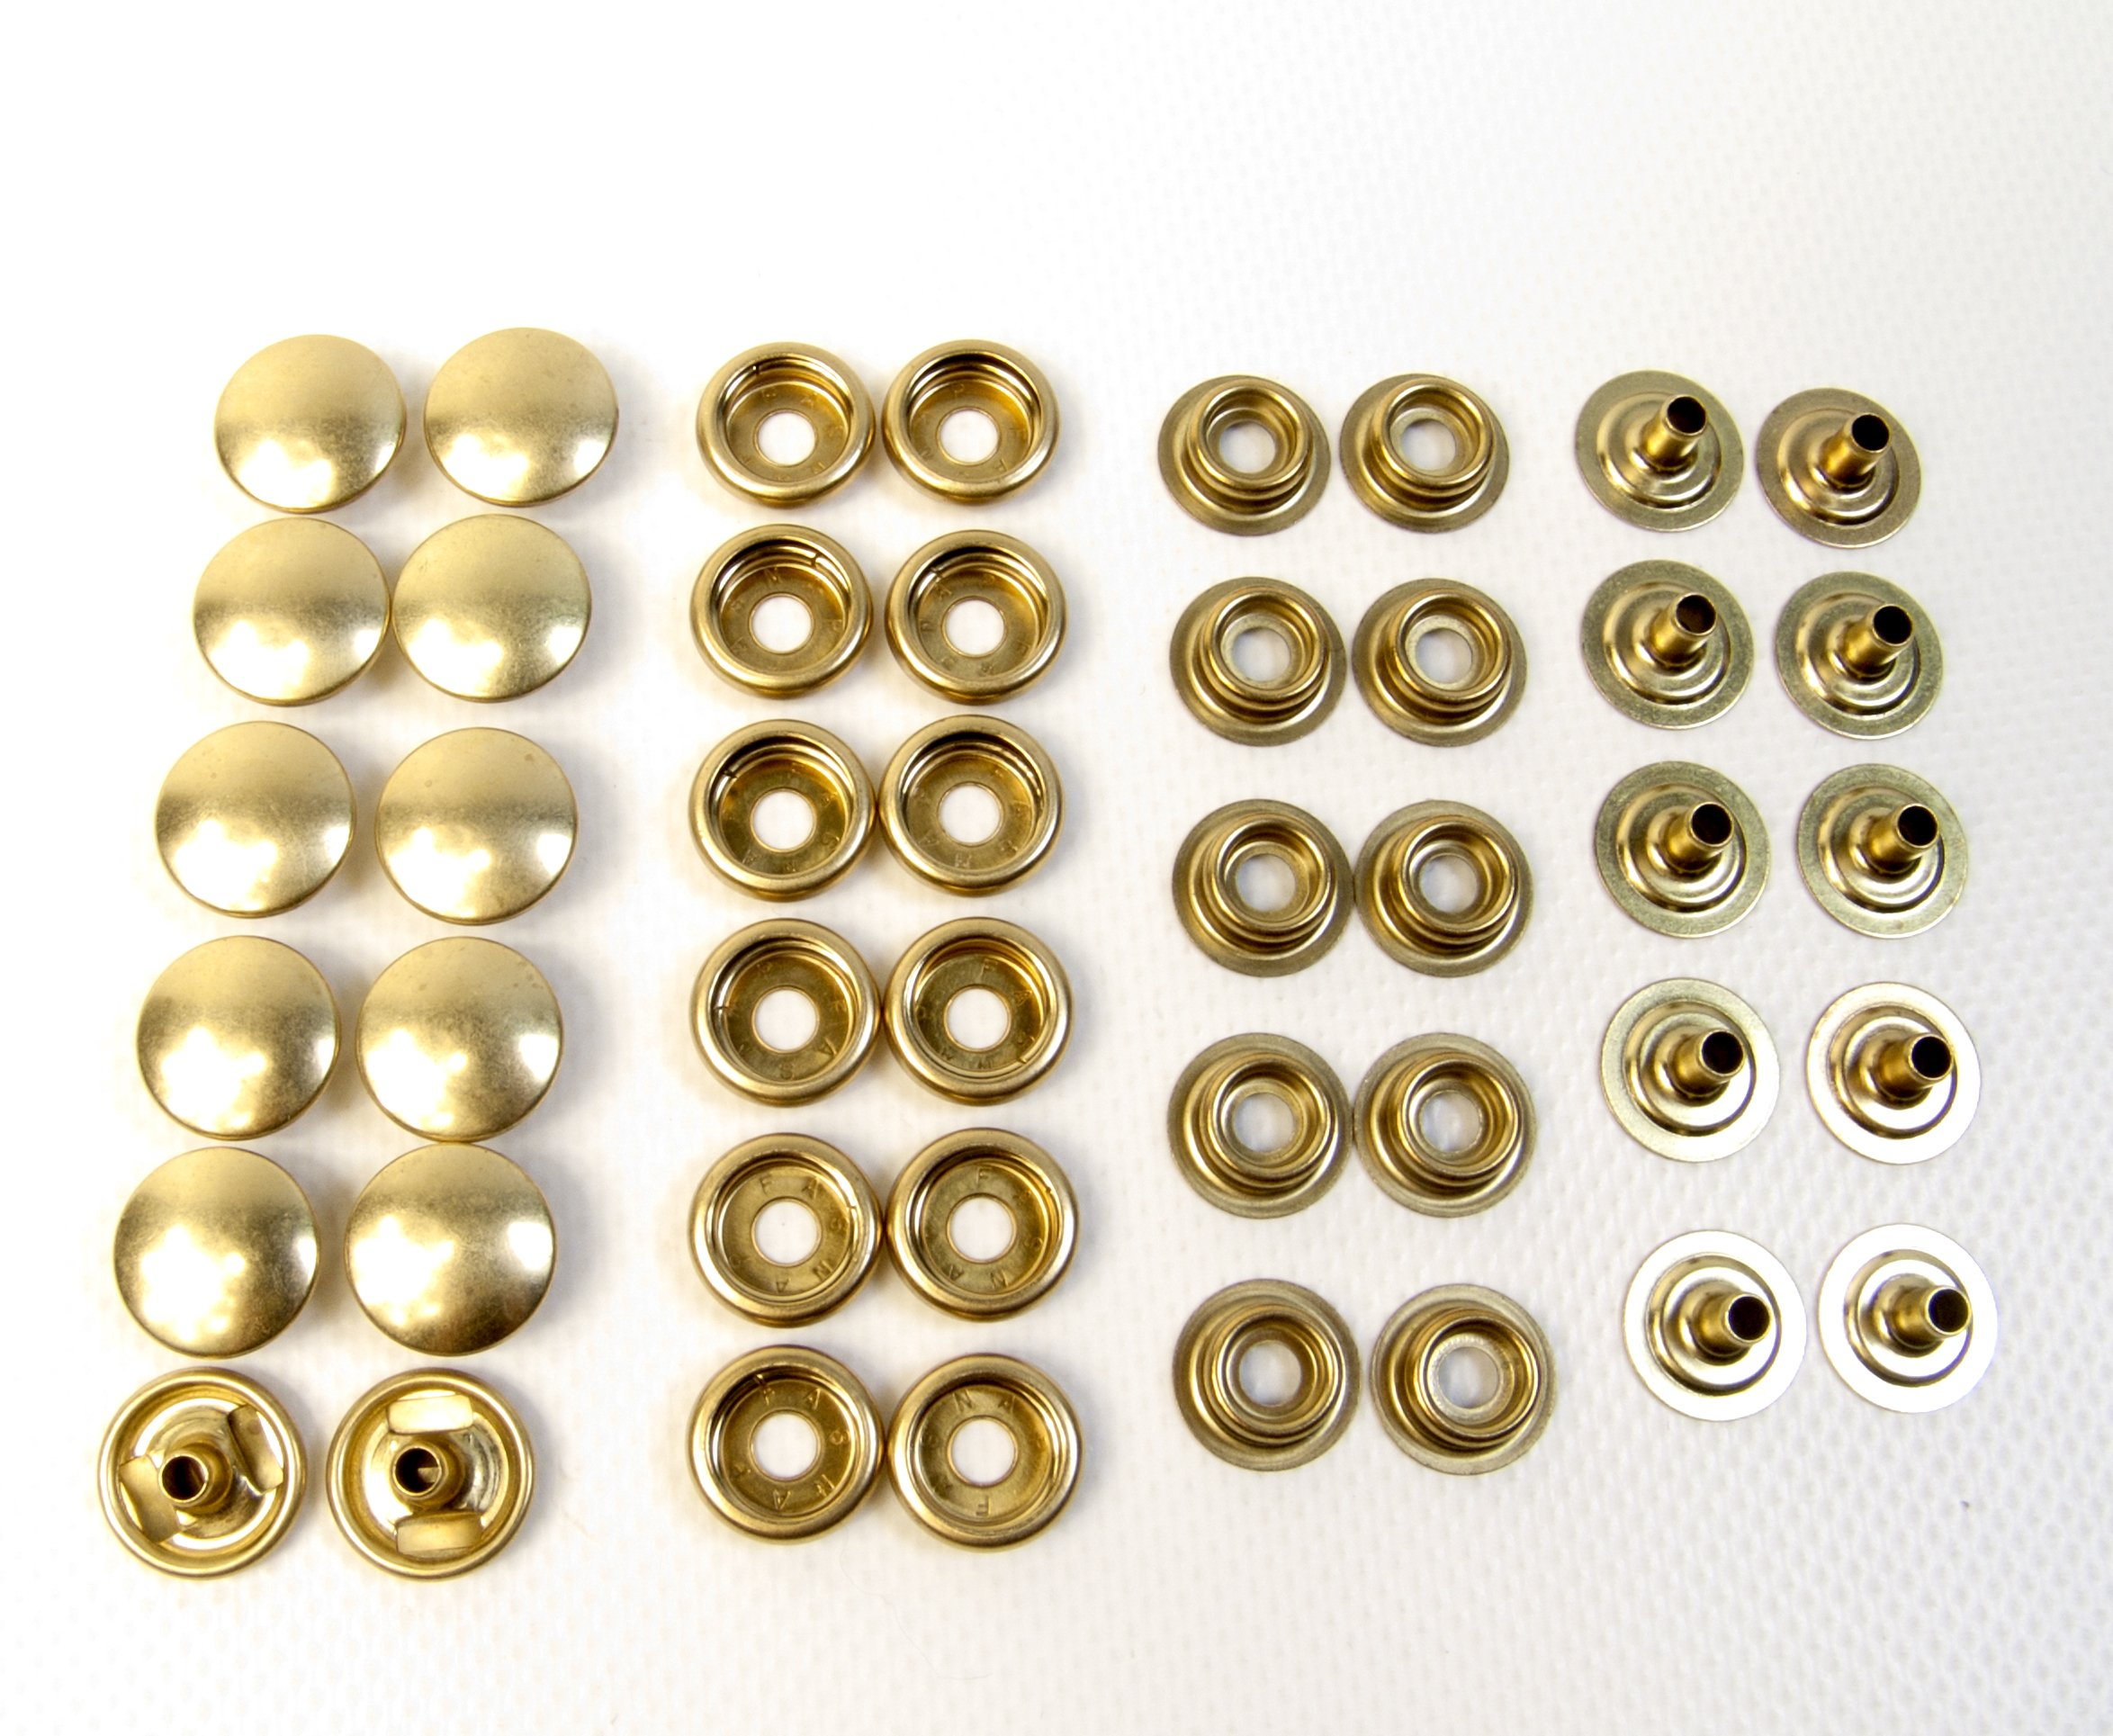 Brass Snaps, 100% Brass Not Plated, Line 24 10 Pc. Set by Brass Snaps (Image #3)